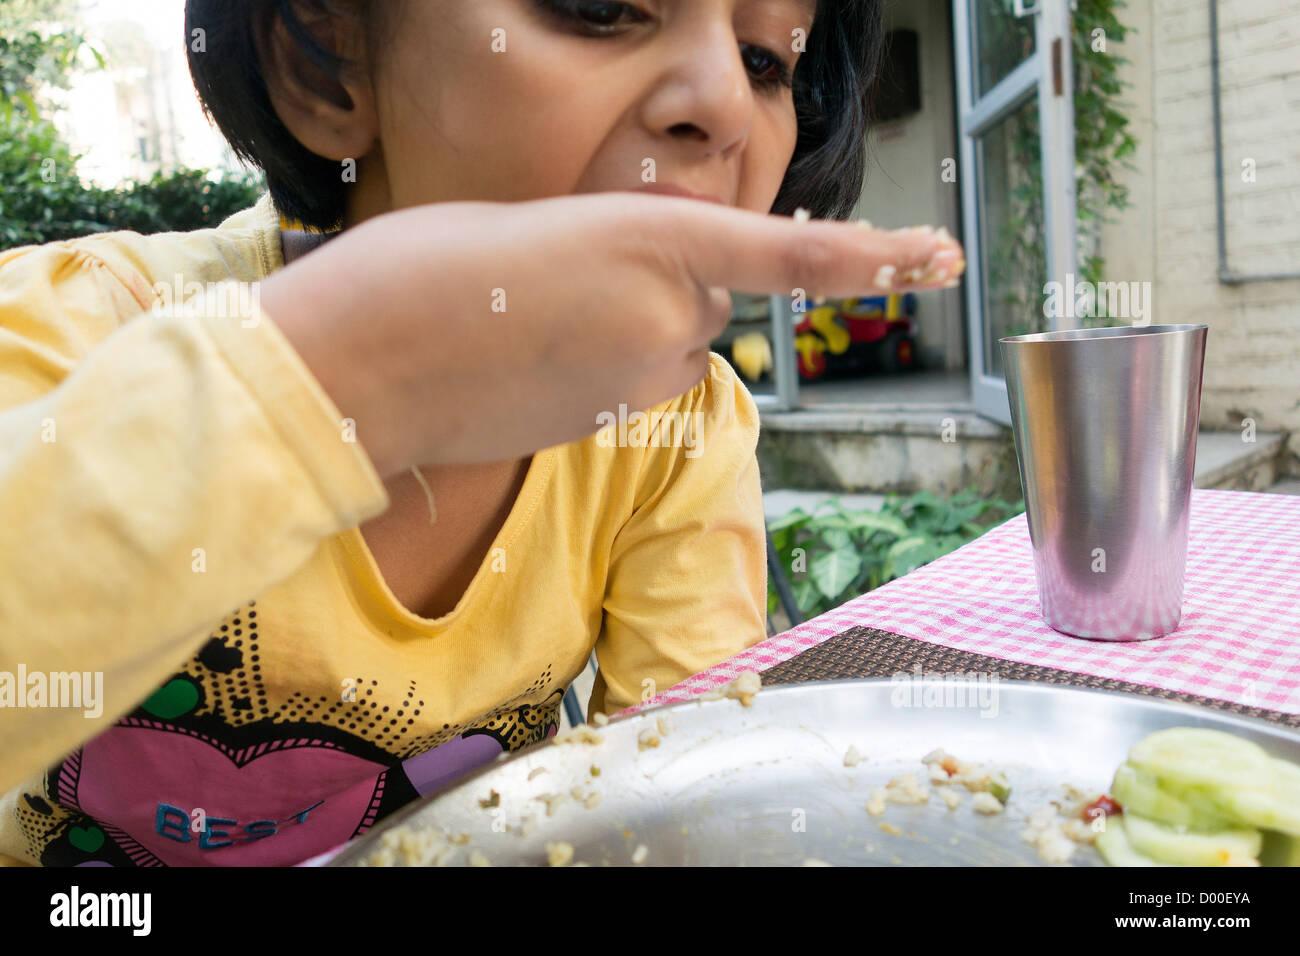 Girlss useing food girl bugil